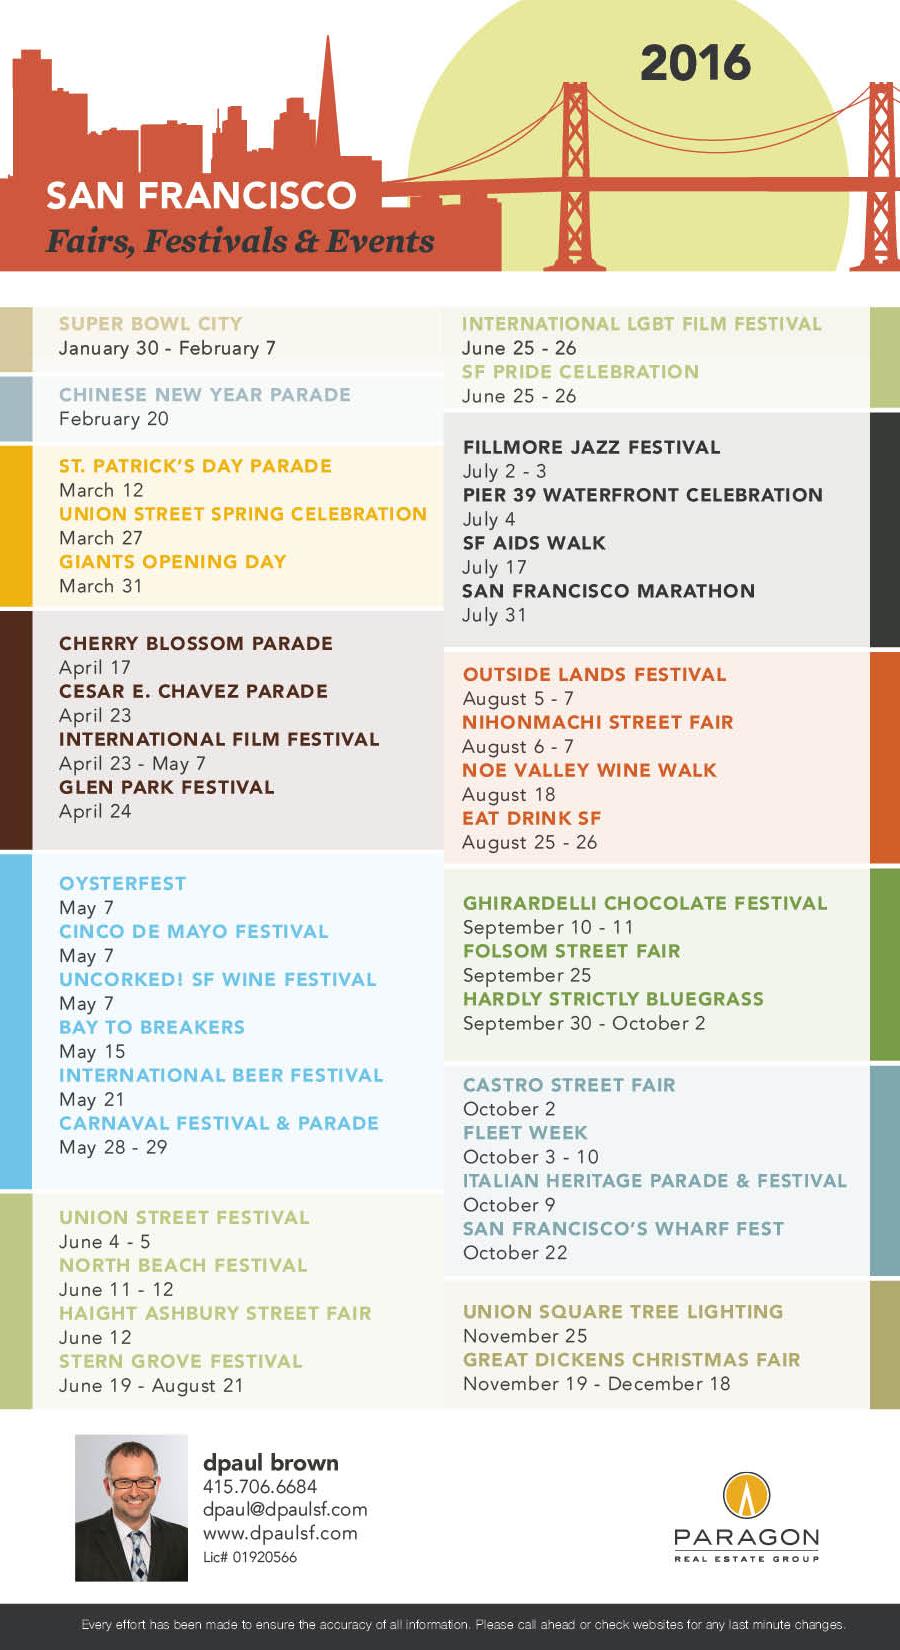 2016 Events Calendar_dpaul